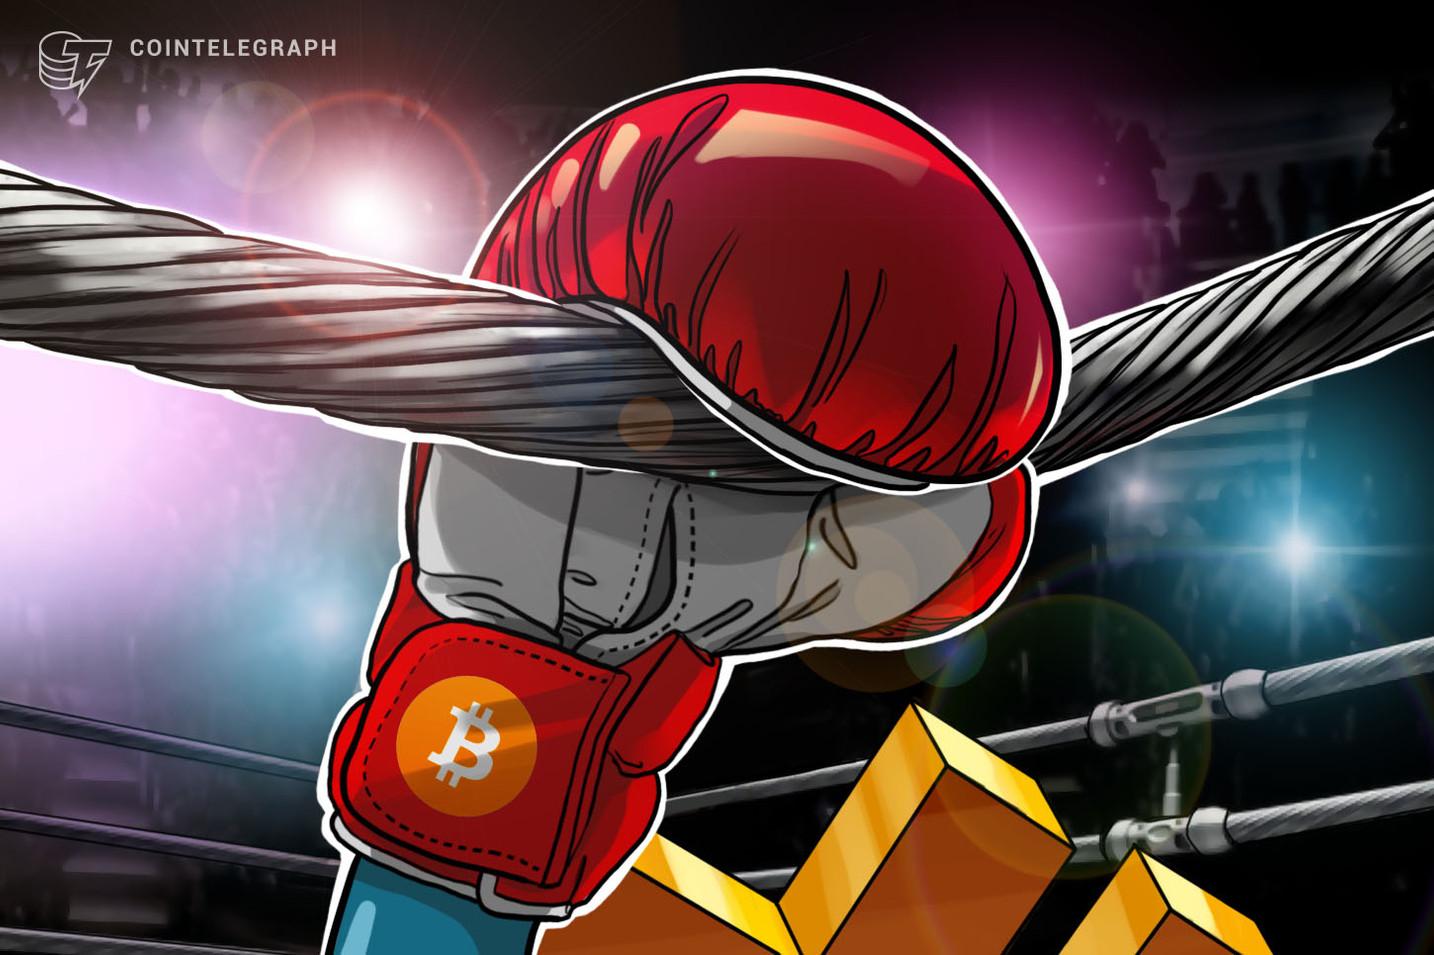 Kryptomärkte im Plus: Bitcoin kommt 5.000-Euro-Marke näher